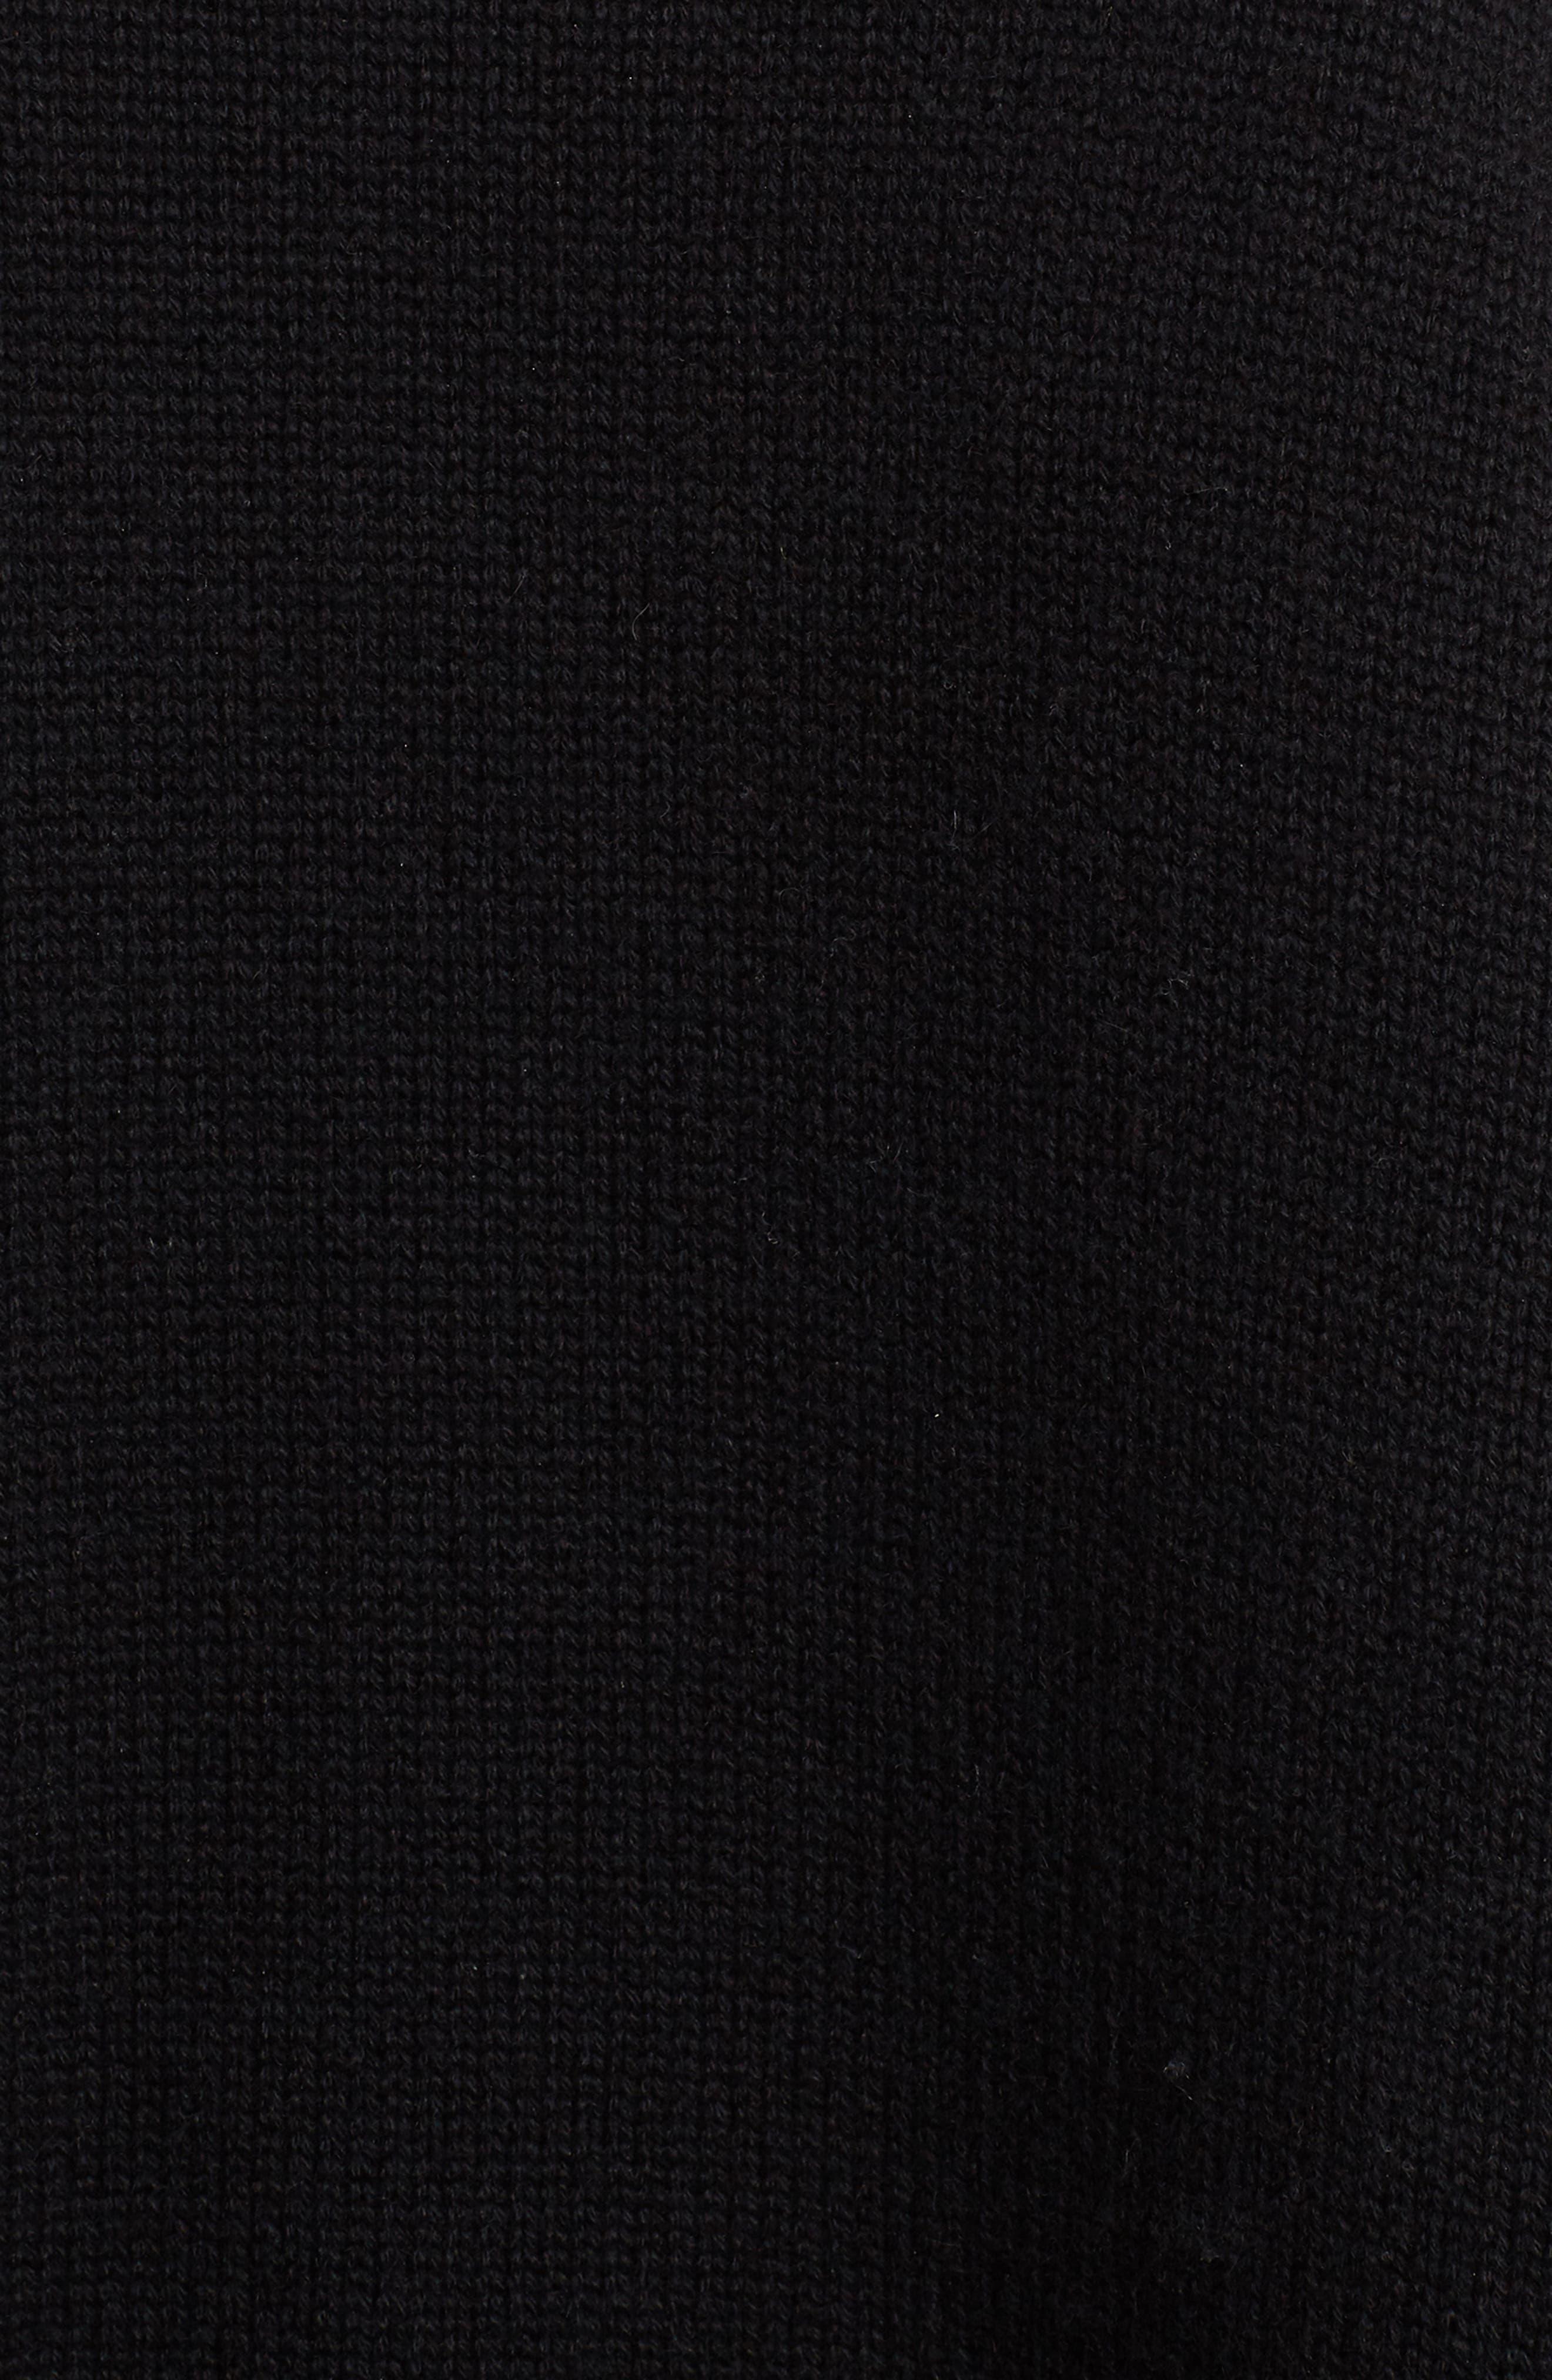 DOLCE&GABBANA,                             Intarsia Logo Cashmere Sweater,                             Alternate thumbnail 5, color,                             BLACK